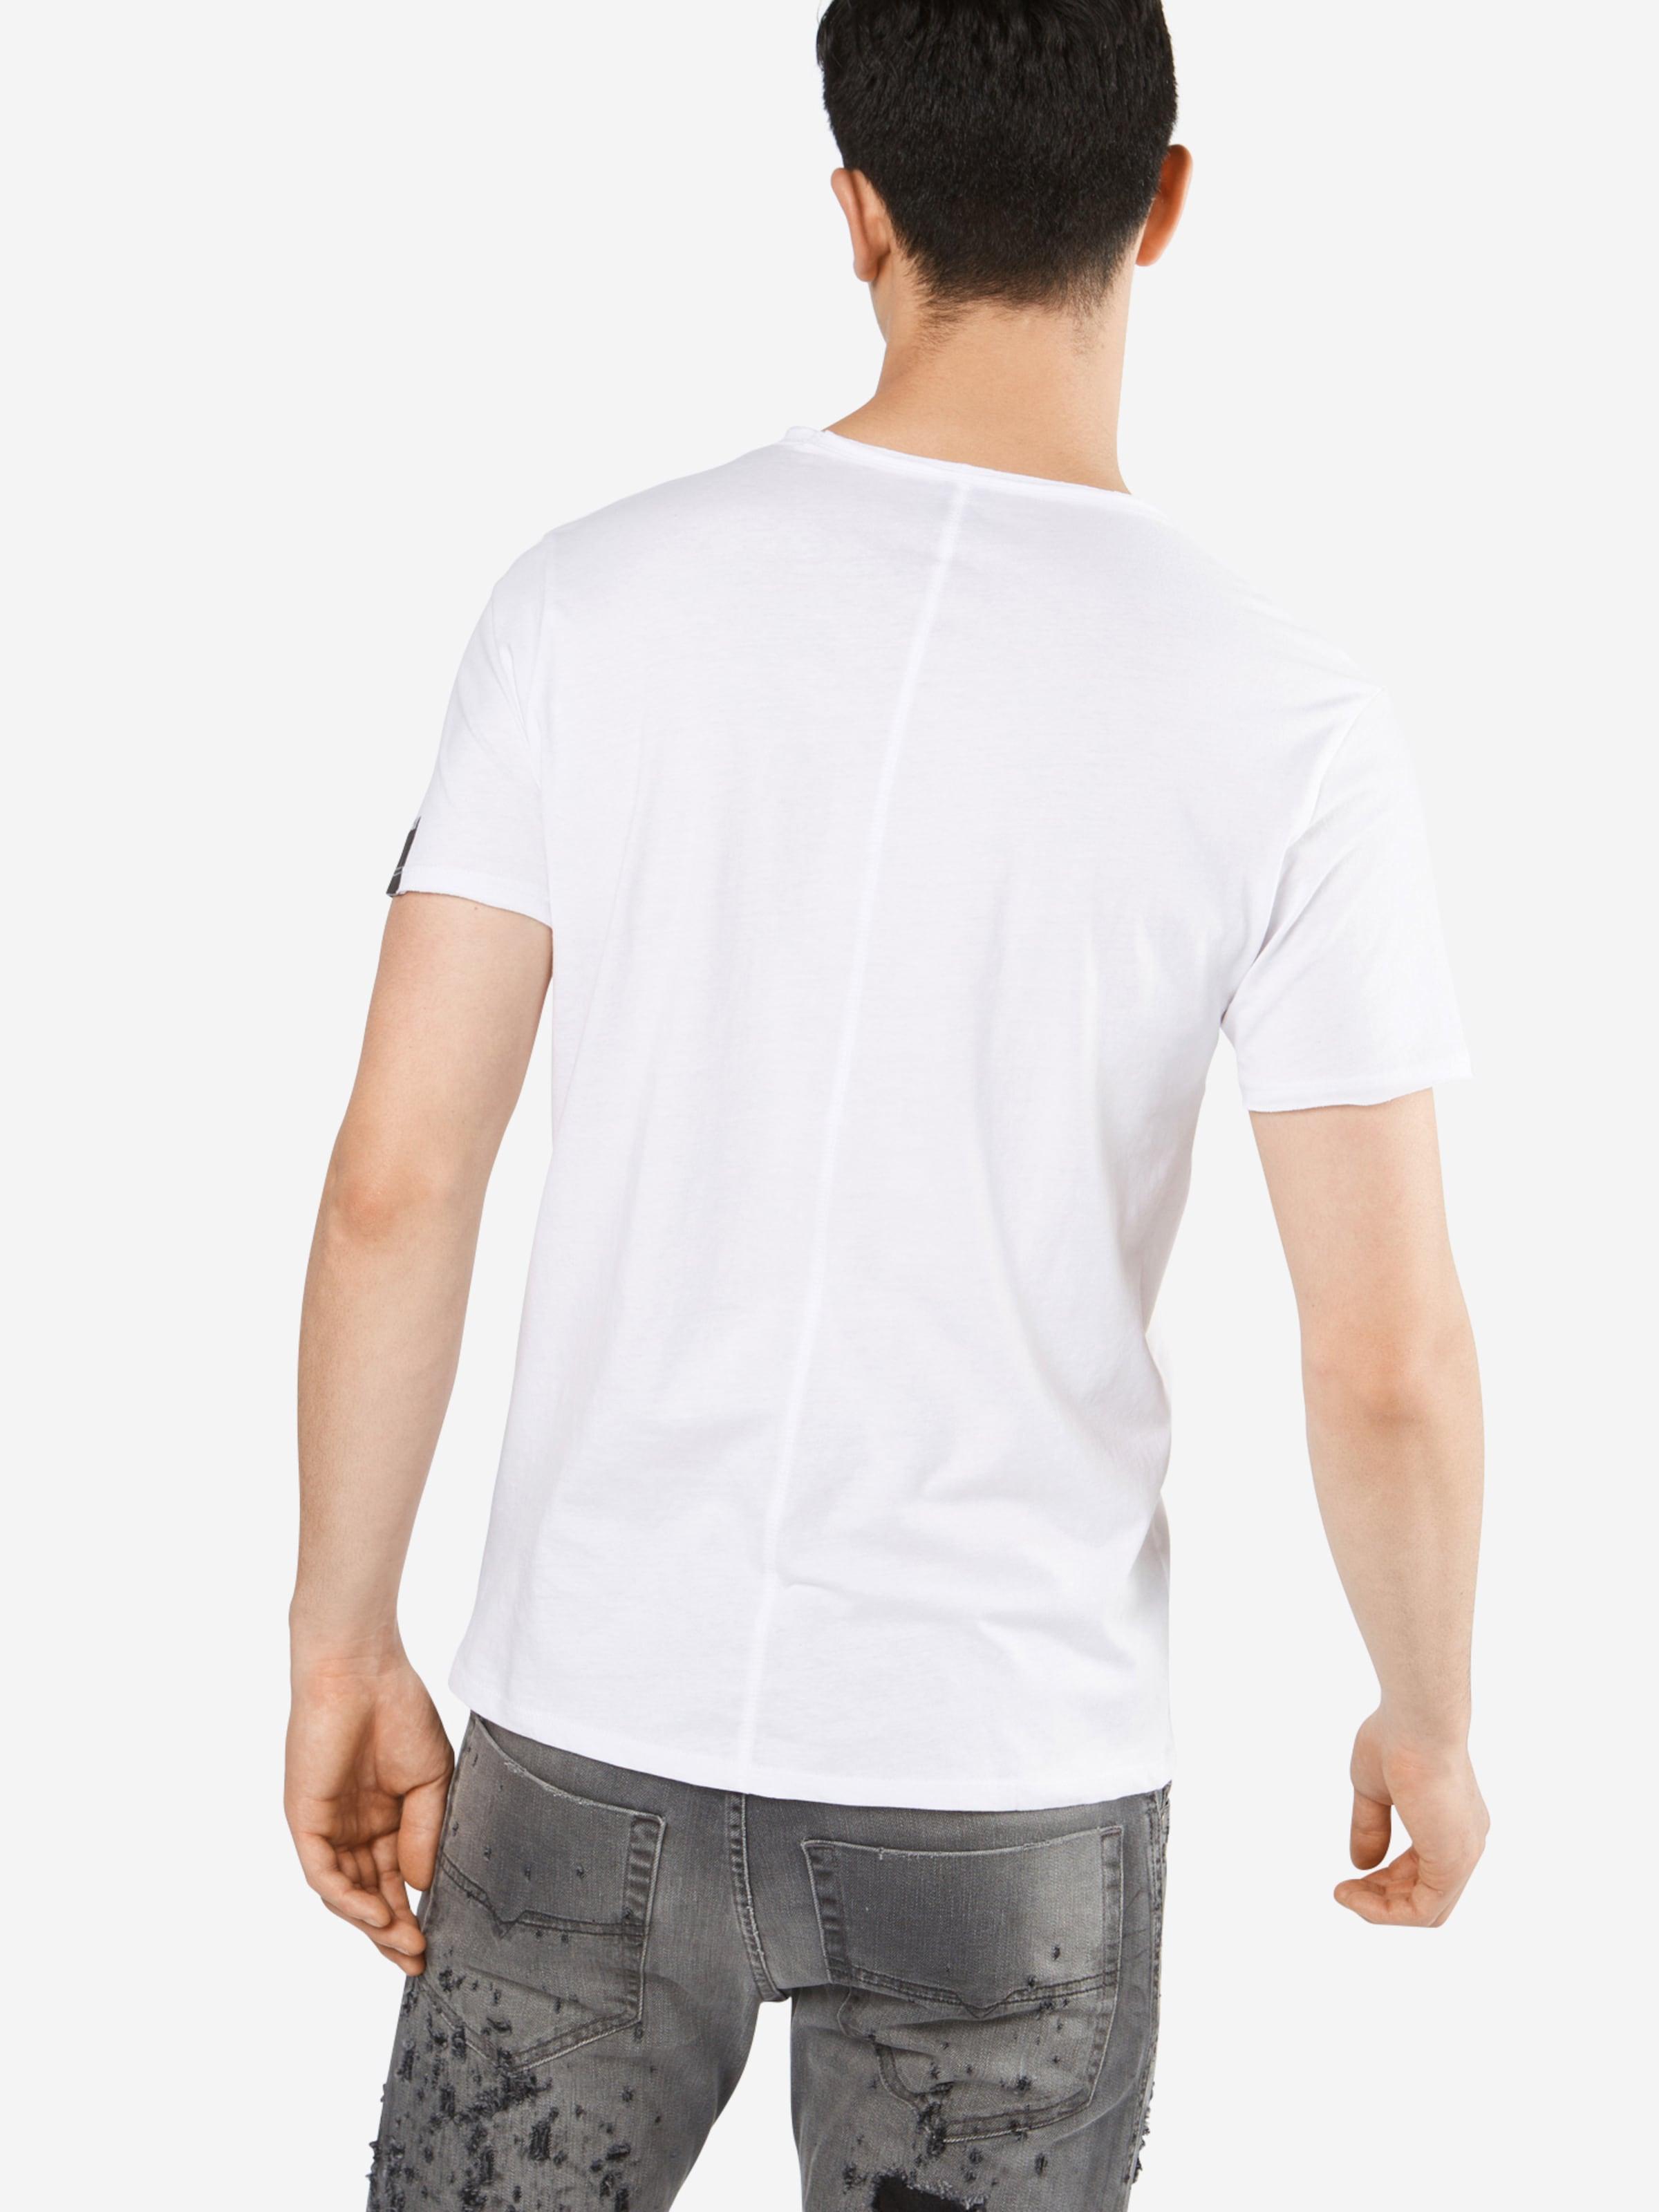 REPLAY T-Shirt Auslass Bestseller Websites Online Billig Footlocker Günstig Kaufen Geniue Händler NffqBaHrqr